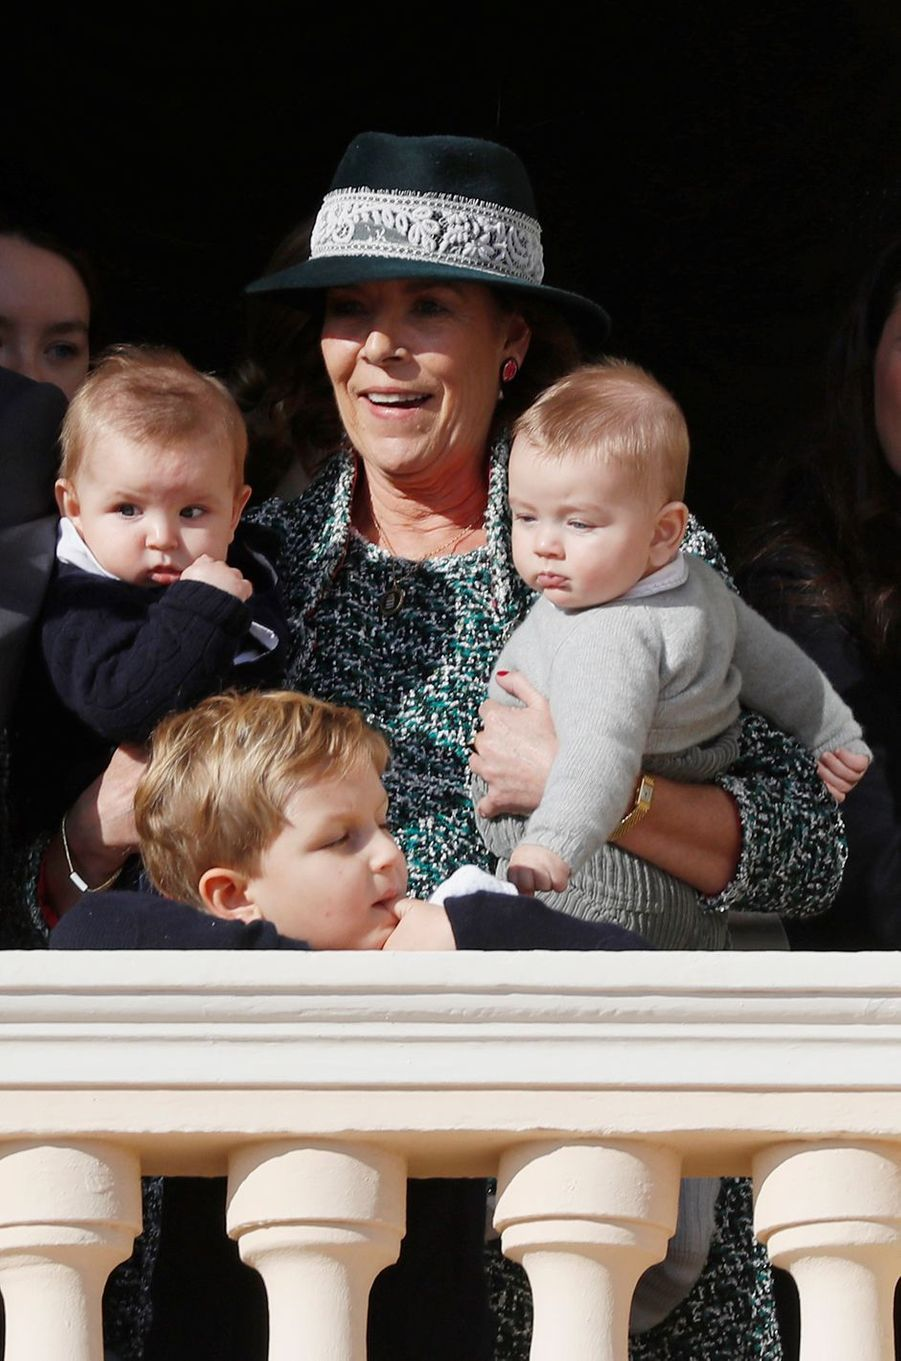 La princesse Caroline de Monaco avec ses deux petits-fils Maximilian Rainier et Francesco Casiraghi, le 19 novembre 2018